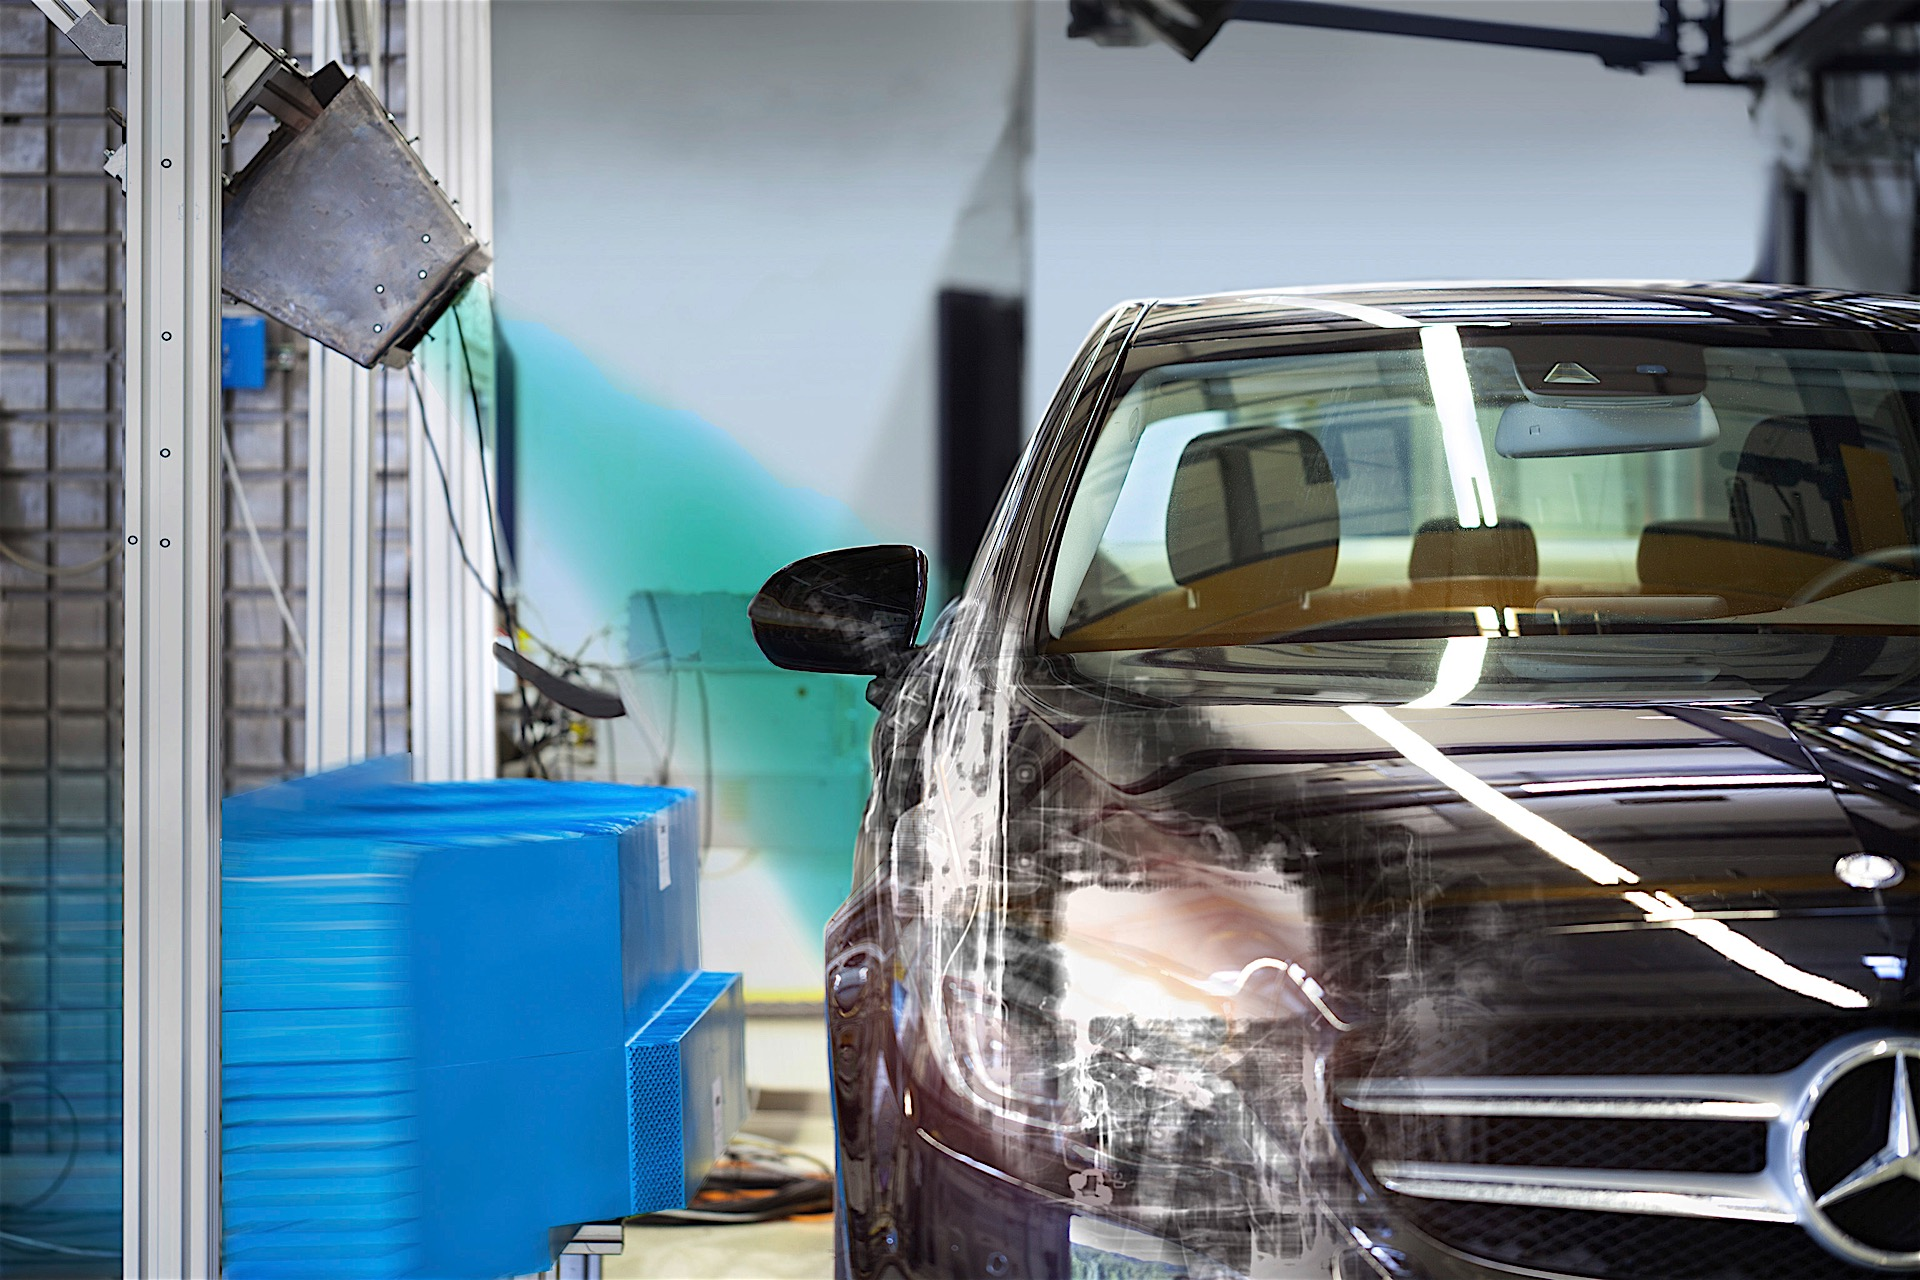 Mercedes cars drive Daimler's surging profit